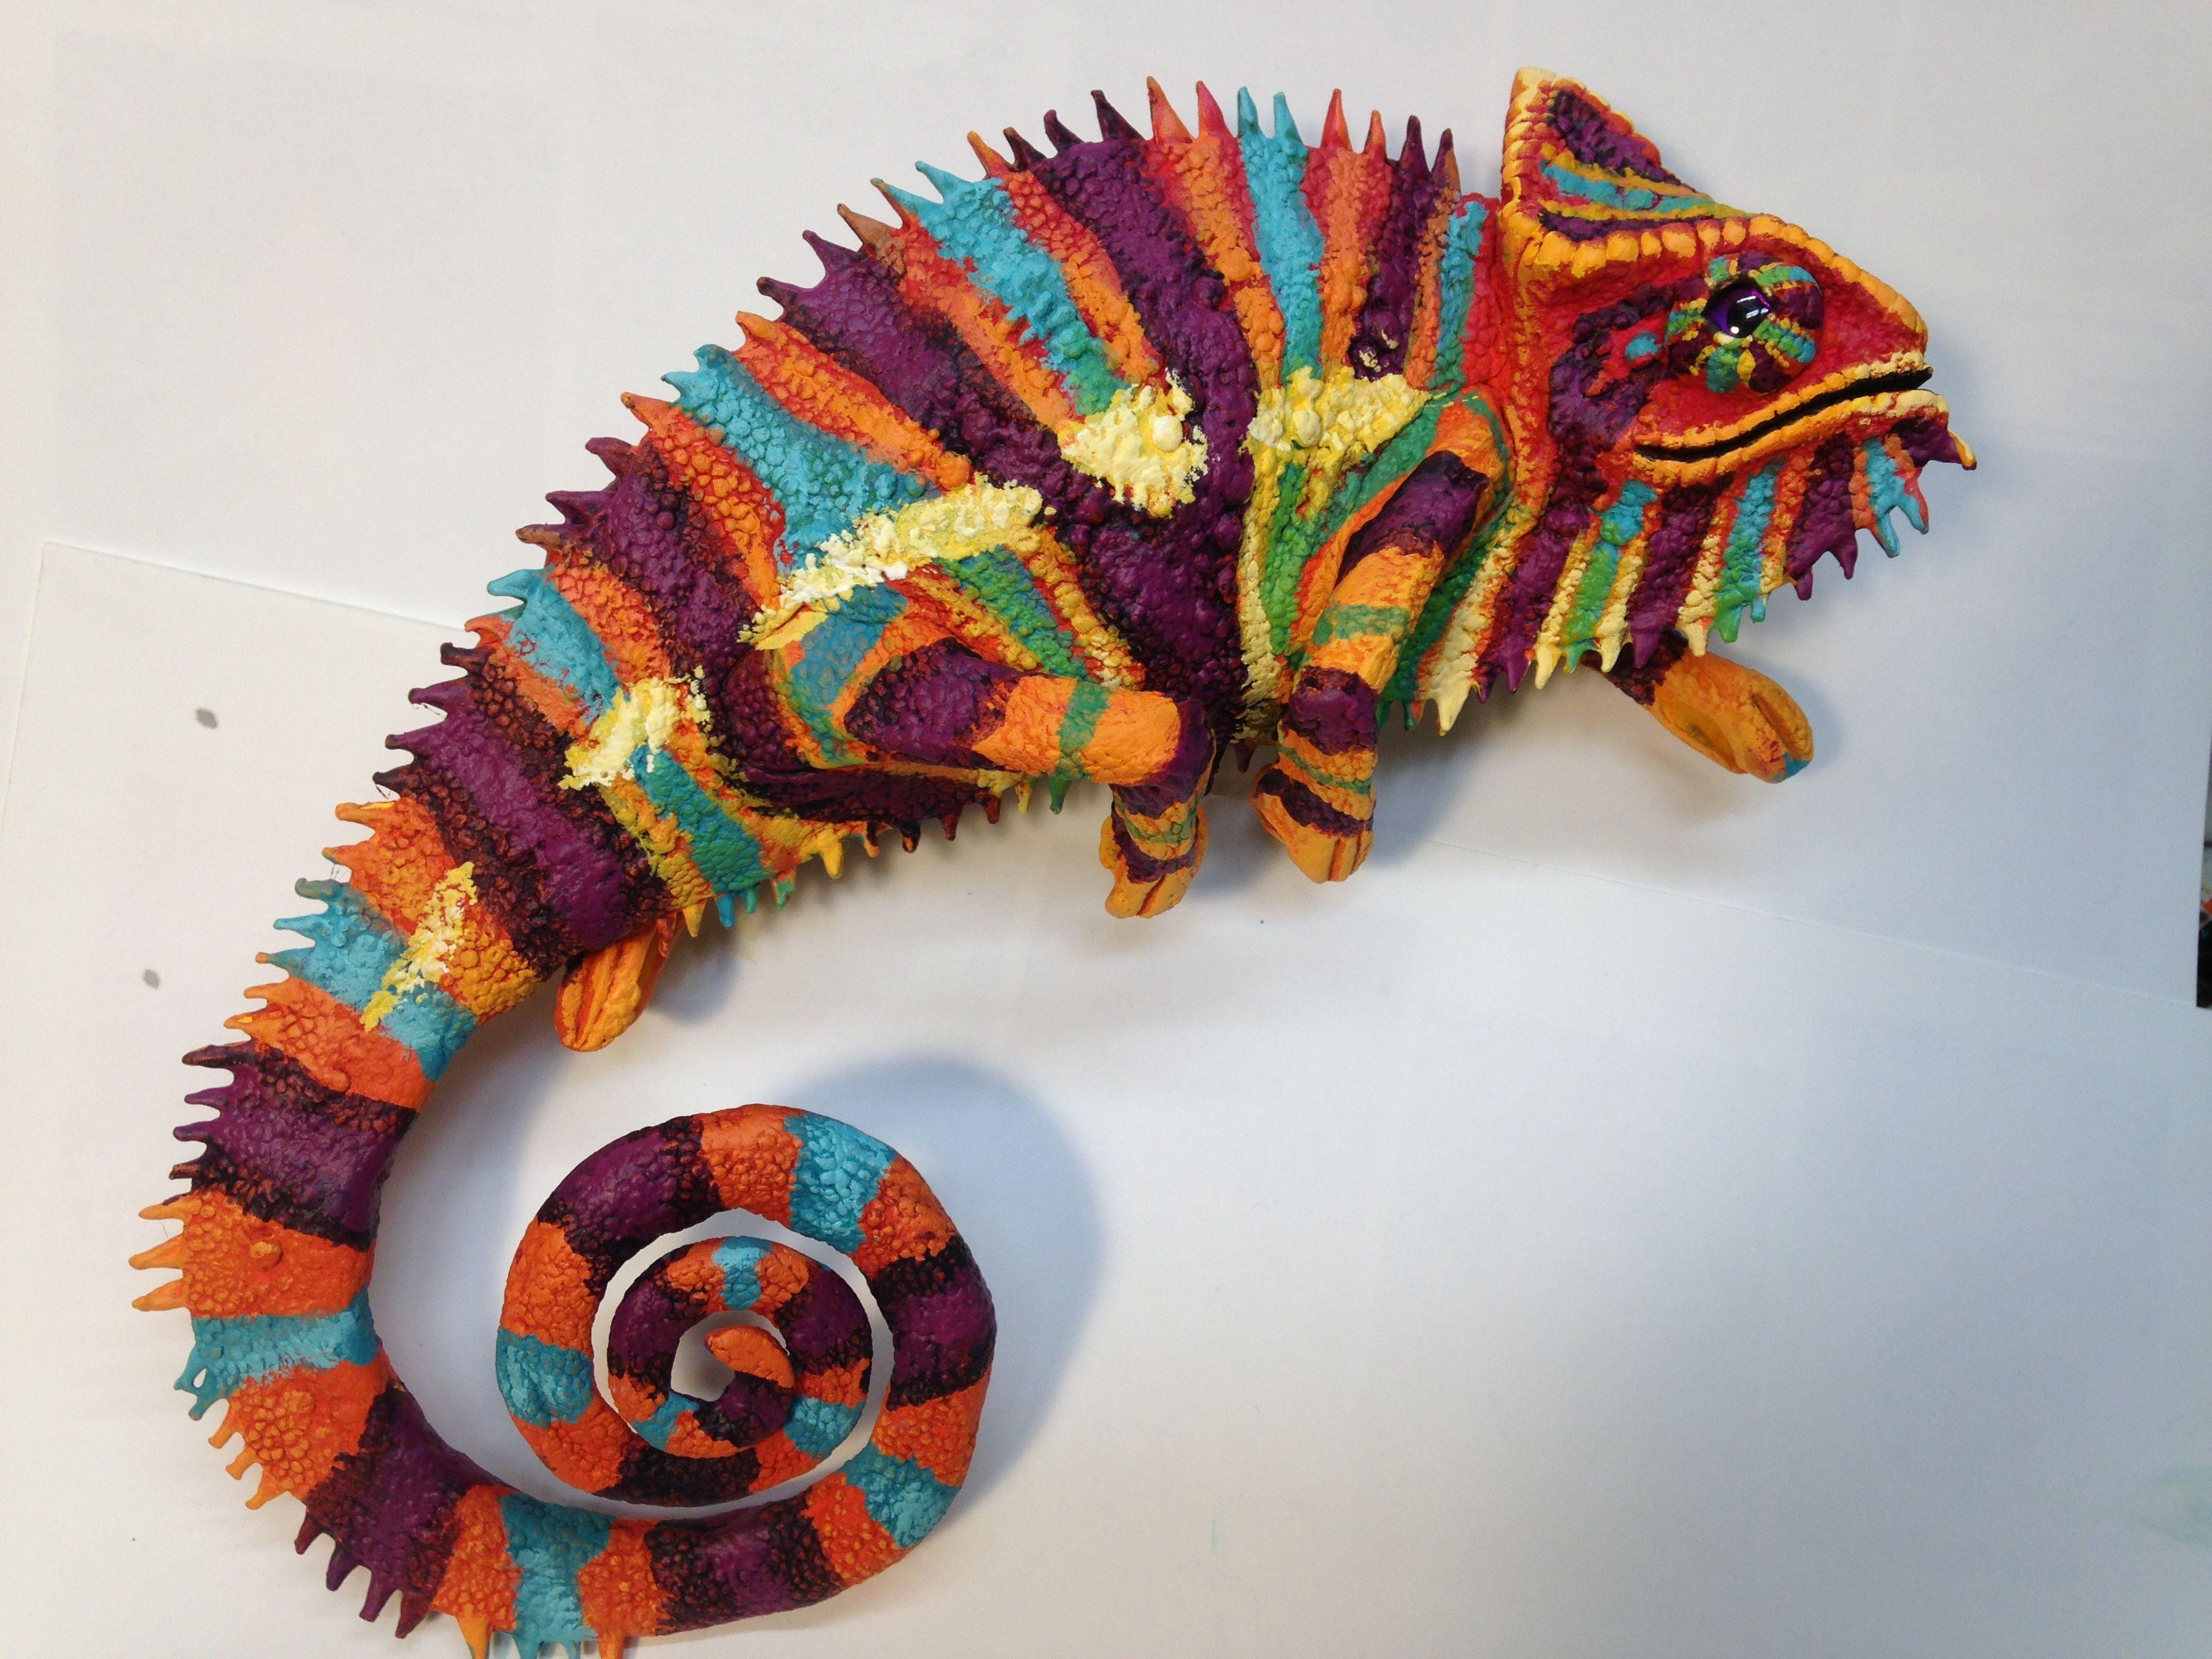 paper mache chameleon paper me pinterest paper mache papier mache and crafty. Black Bedroom Furniture Sets. Home Design Ideas